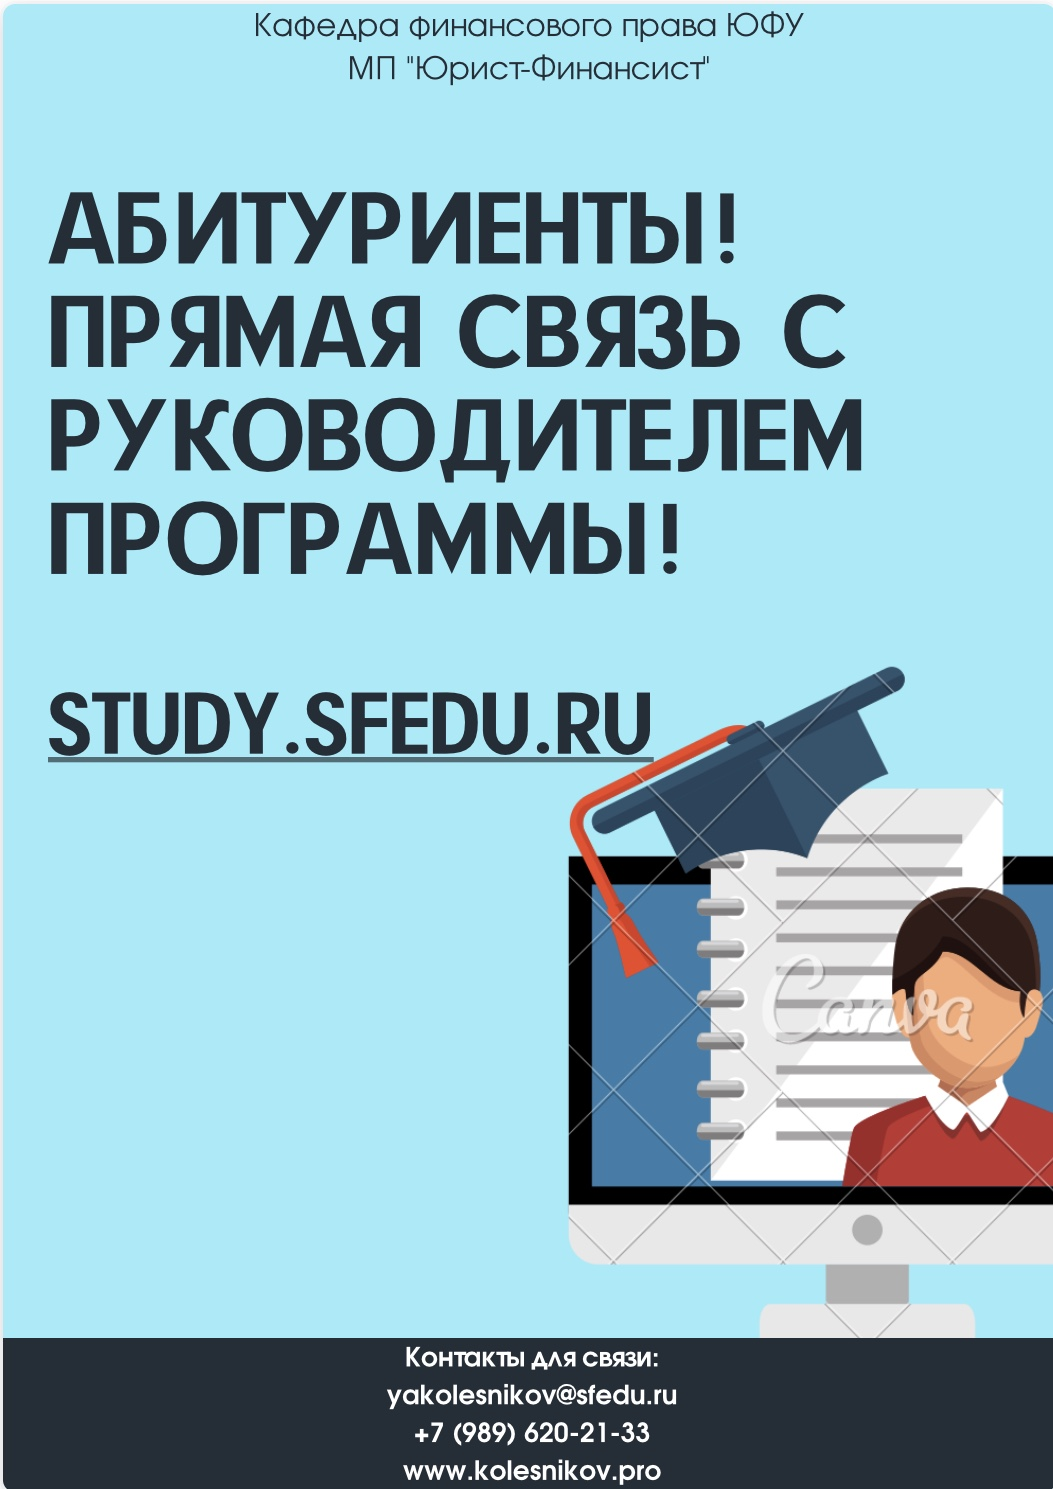 Важная информация: